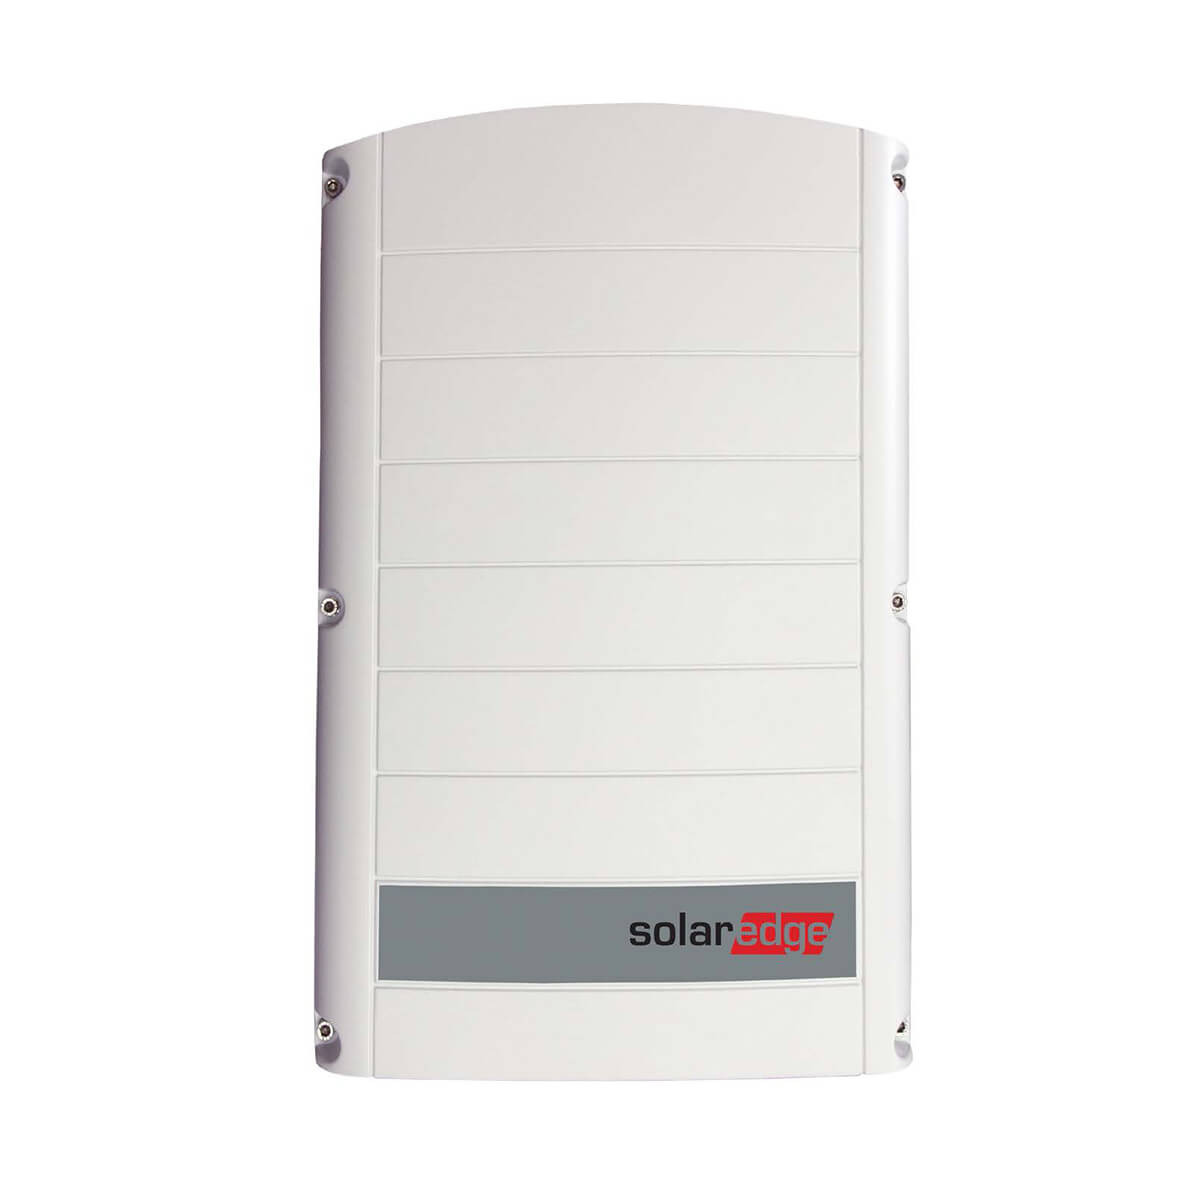 solaredge 17kW inverter, solaredge se17k 17kW inverter, solaredge se17k inverter, solaredge se17k, solaredge 17 kW